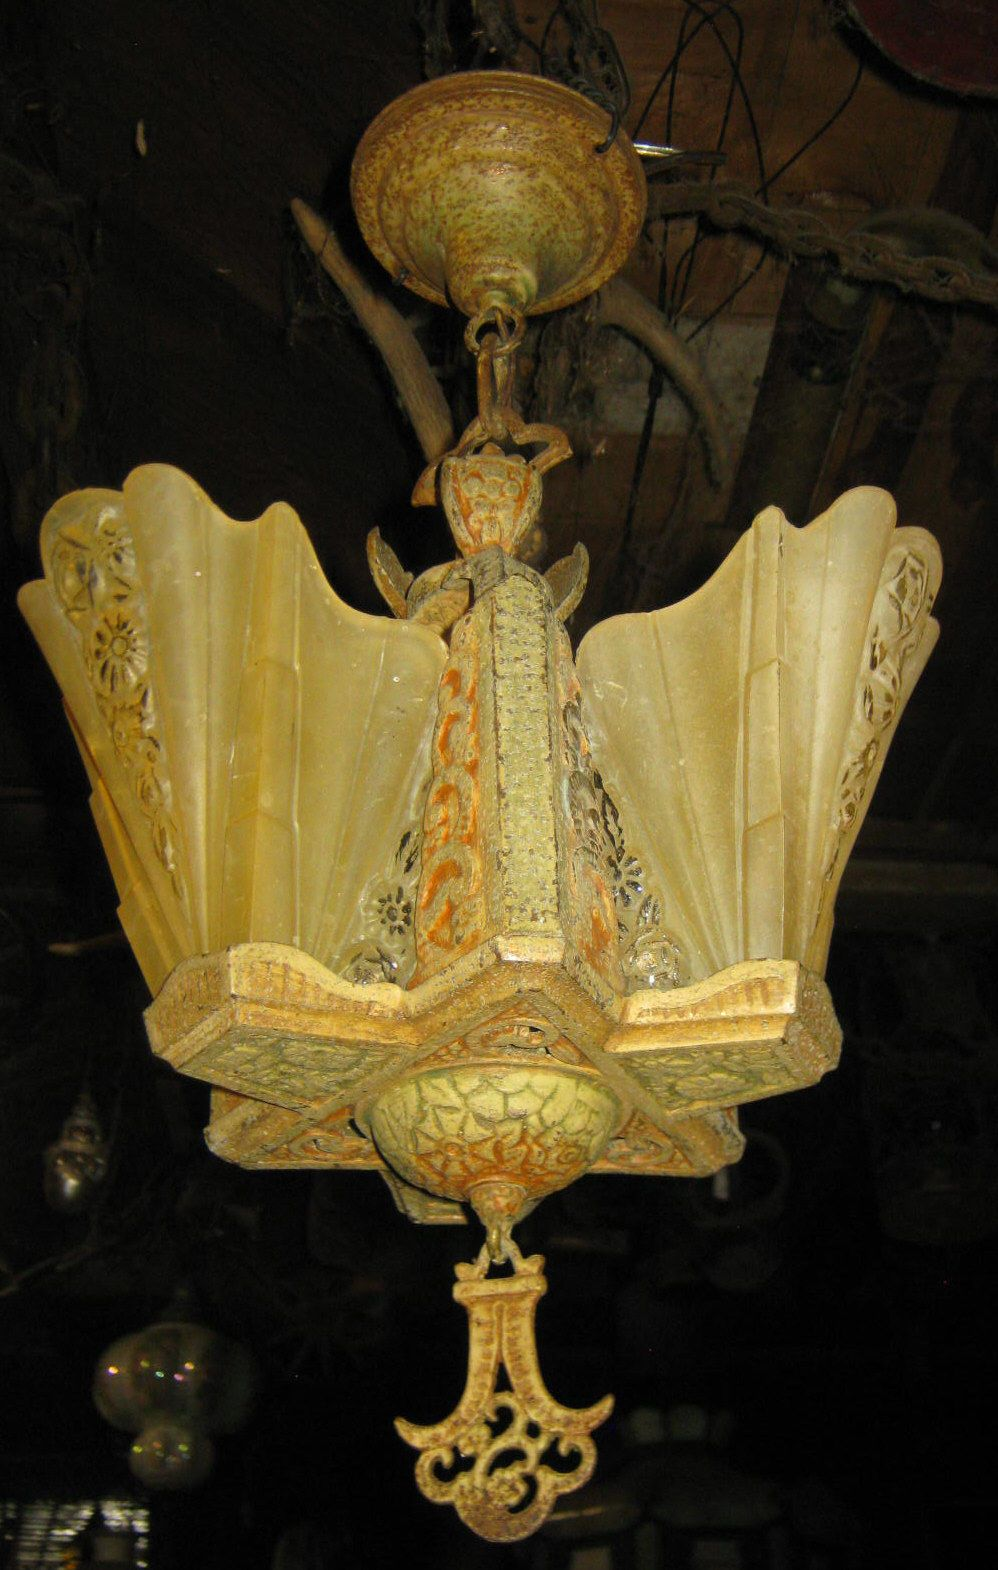 Antique architectural art deco chandelier lamp glass slip shade ...